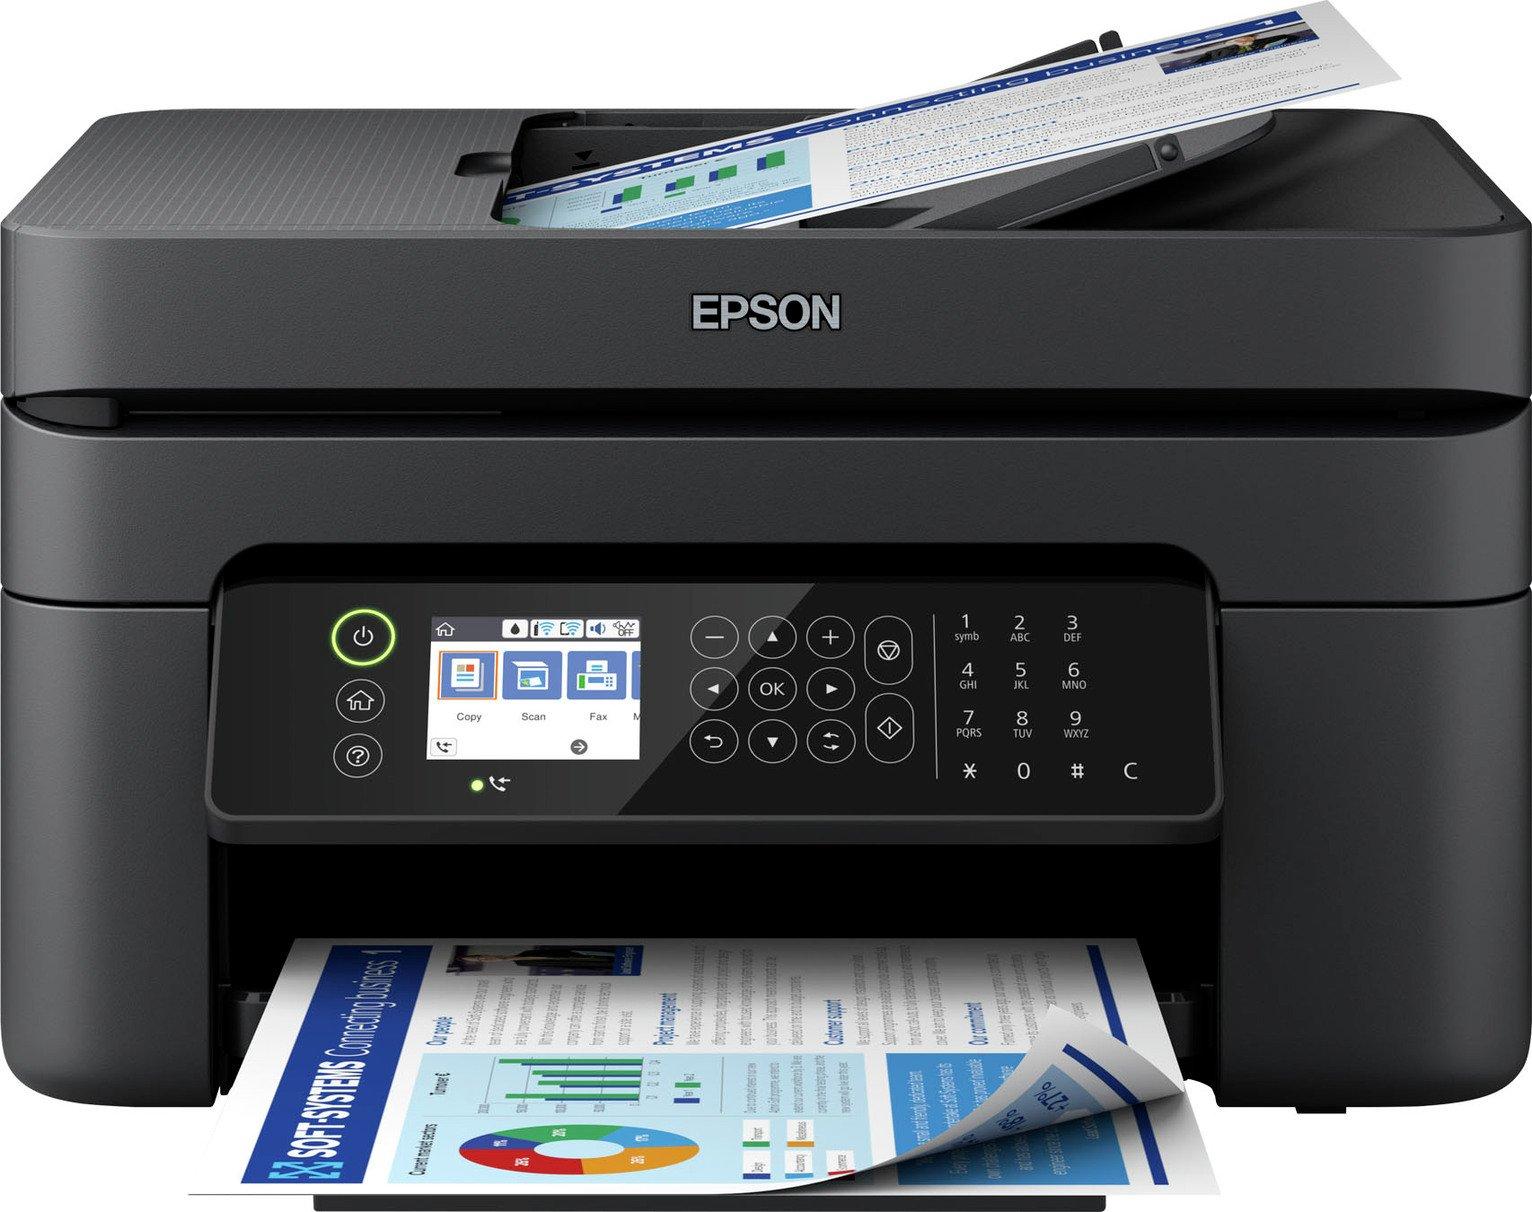 Epson WorkForce 2850DWF Wireless Inkjet Printer